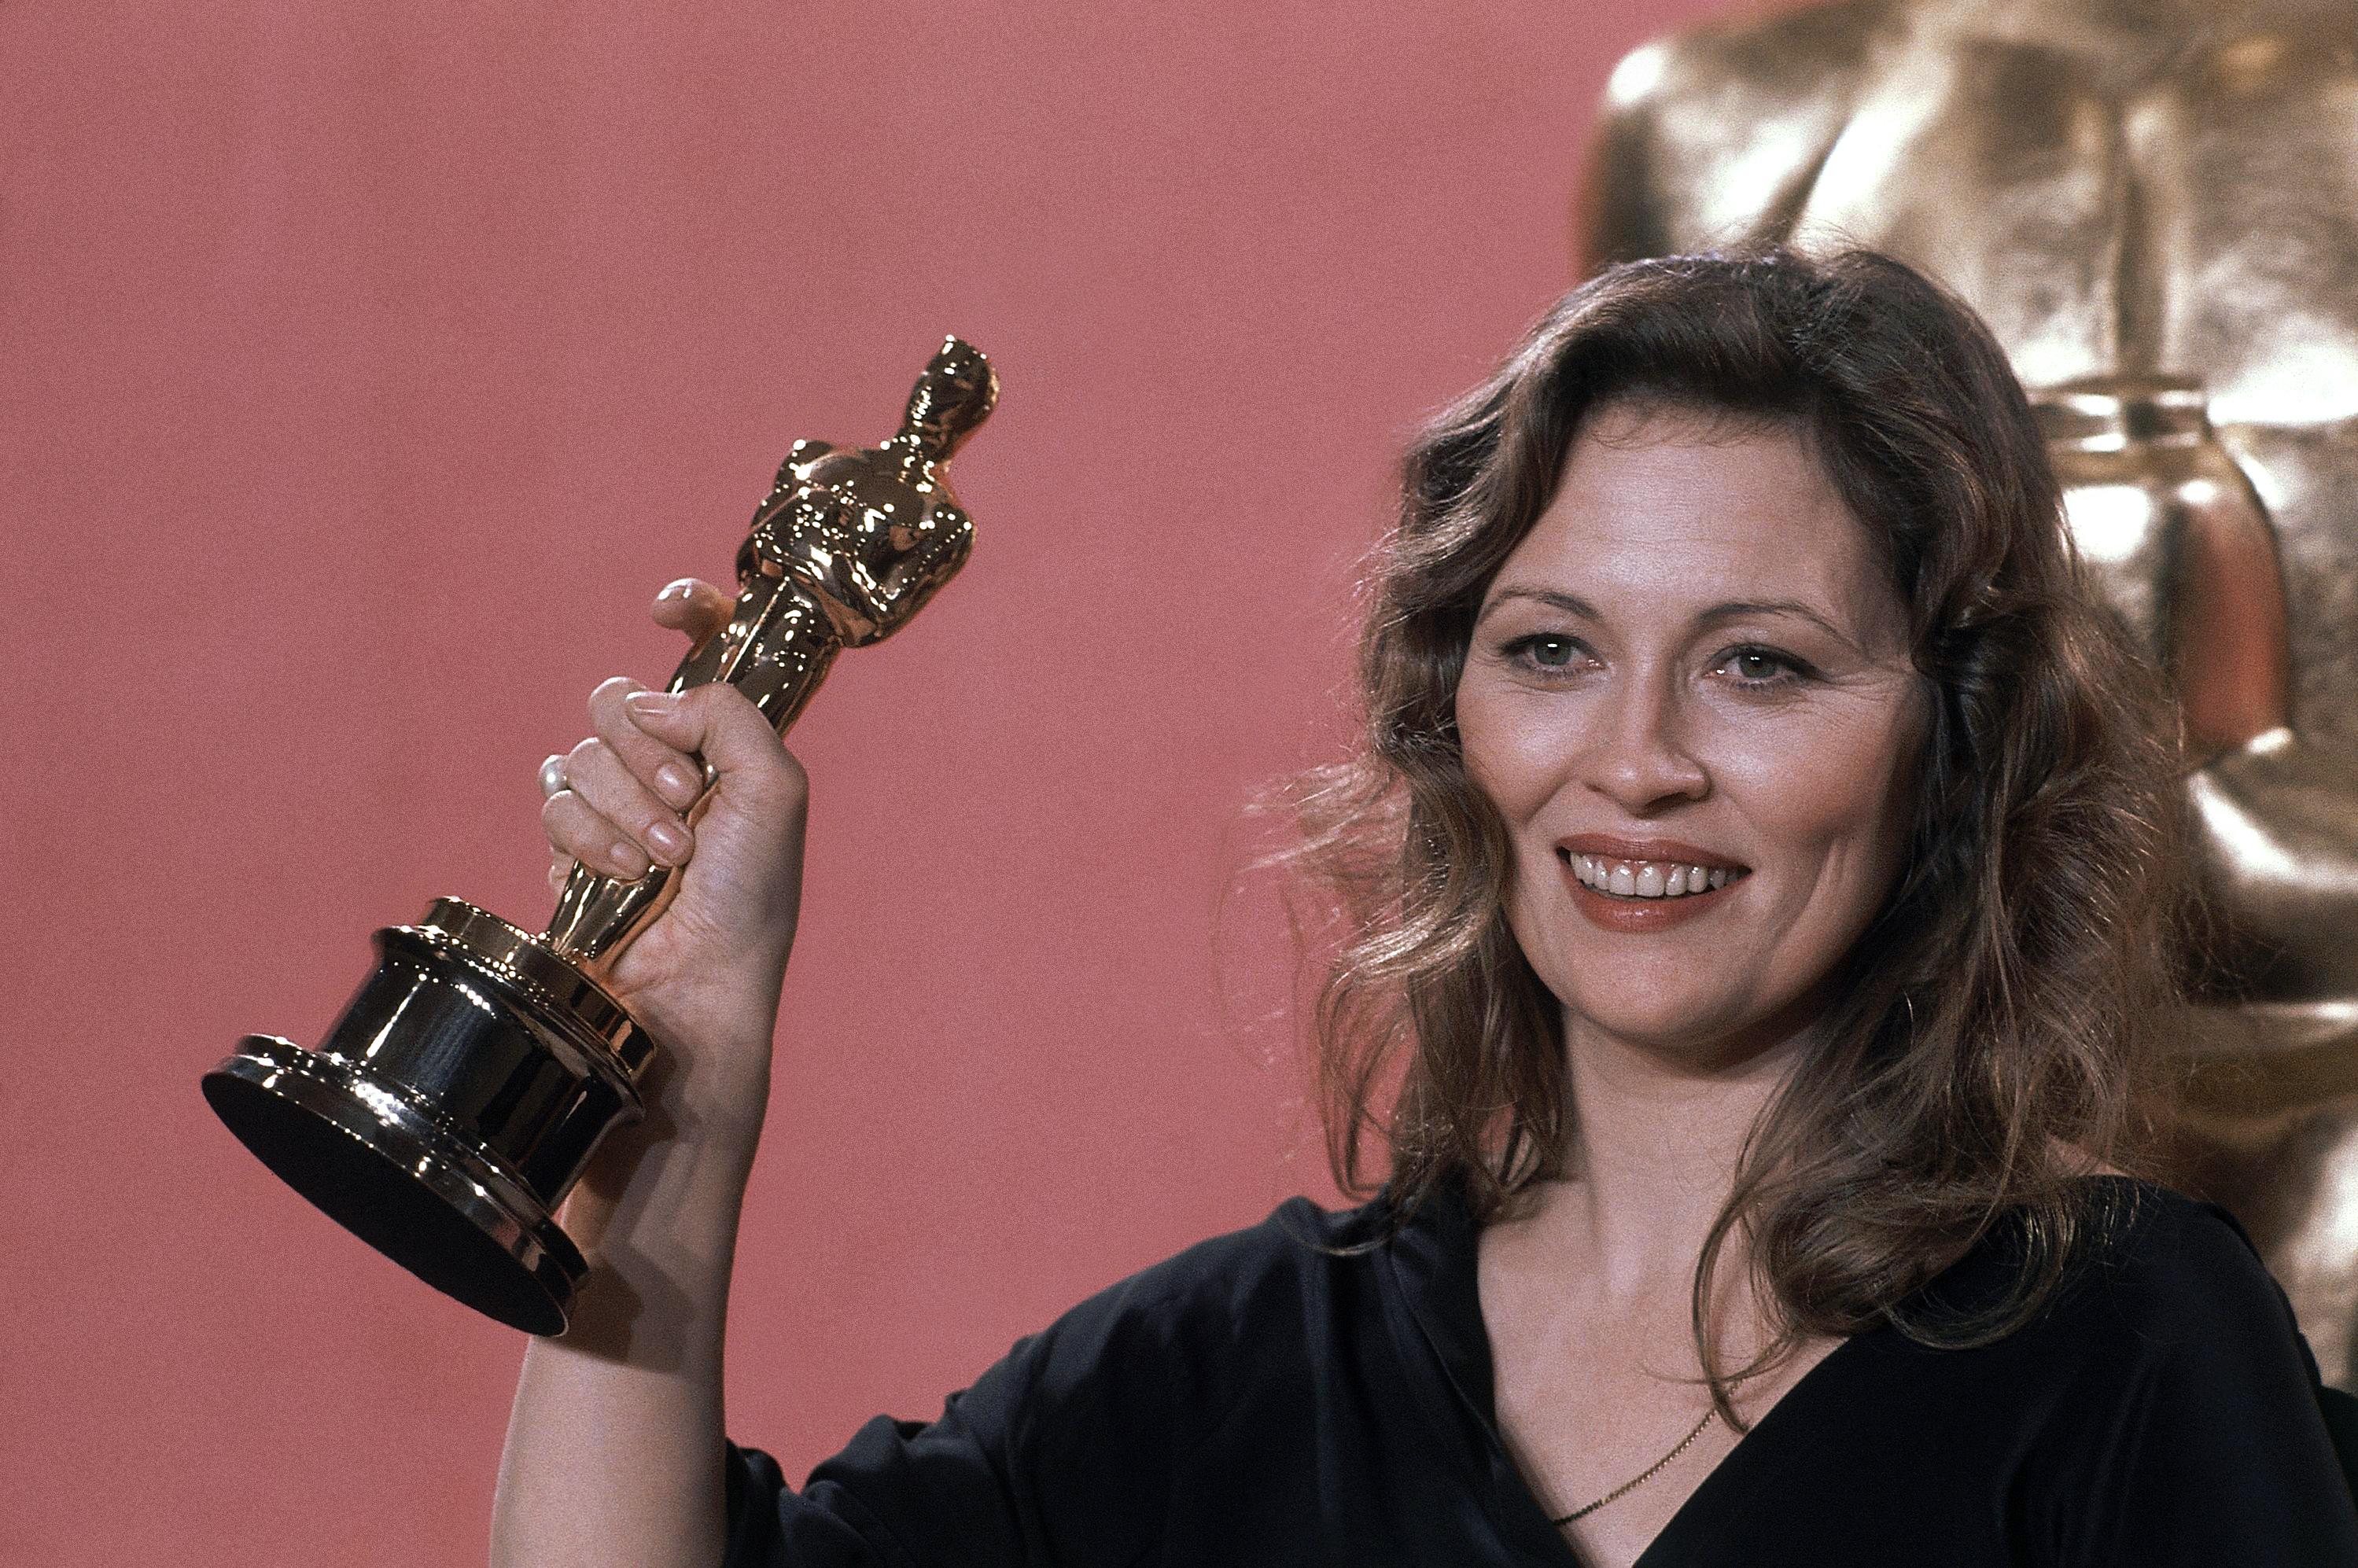 Quinto Potere: Faye Dunaway stringe l'Oscar vinto per Miglior Attrice protagonista